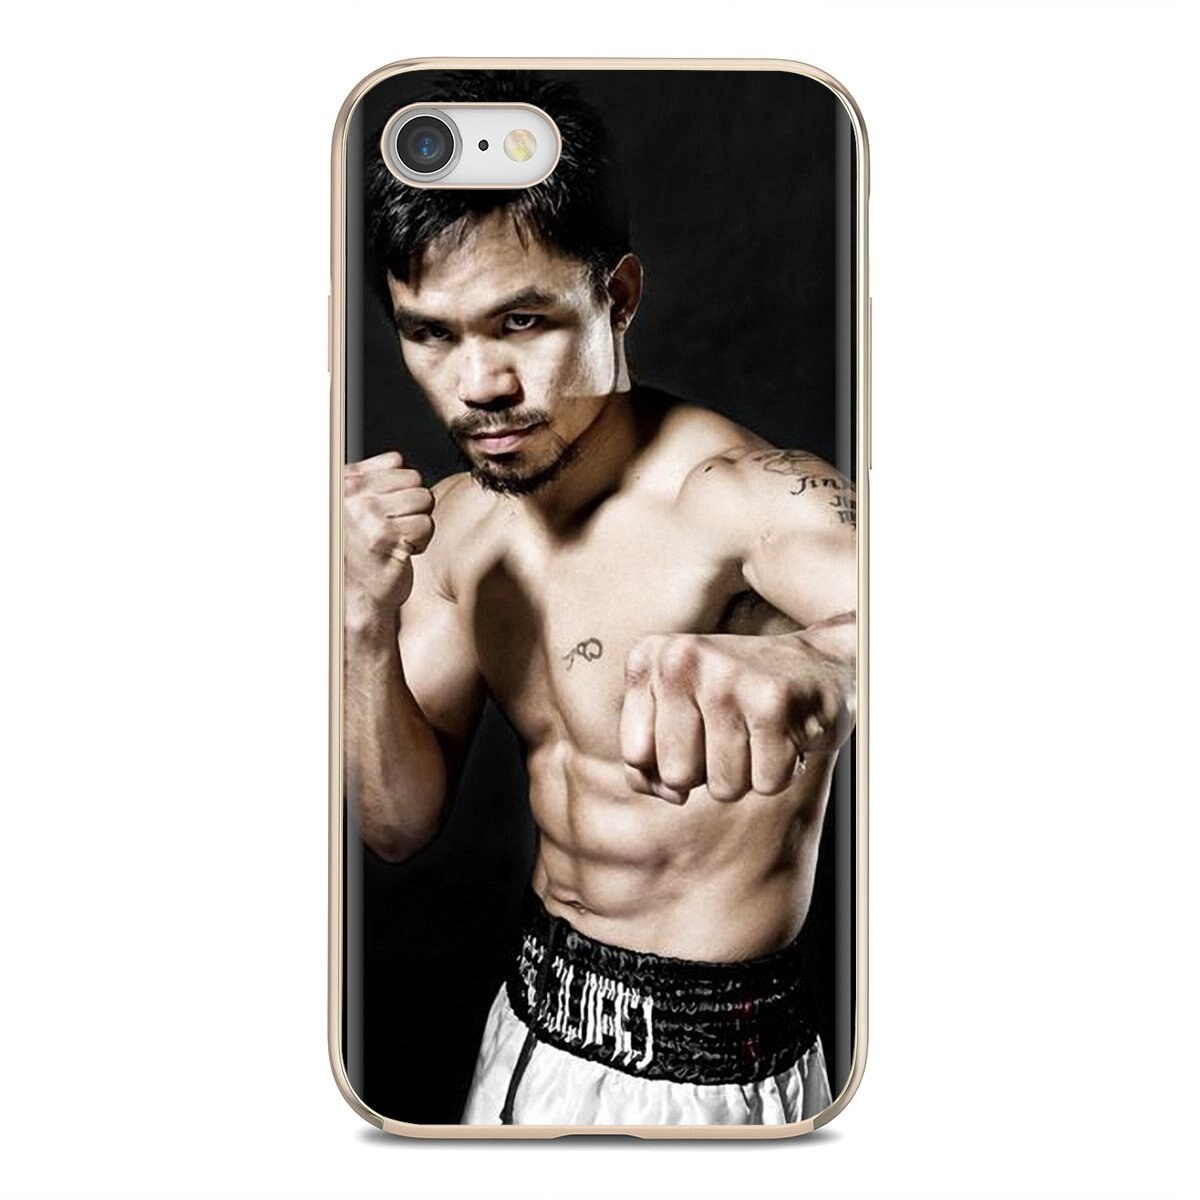 Manny Pacquiao Pinoy Pacman de boxeo para Samsung Galaxy nota 2 3 4 5 8 9 S2 S3 S4 S5 Mini S6 S7 borde S8 S9 Plus cubierta suave